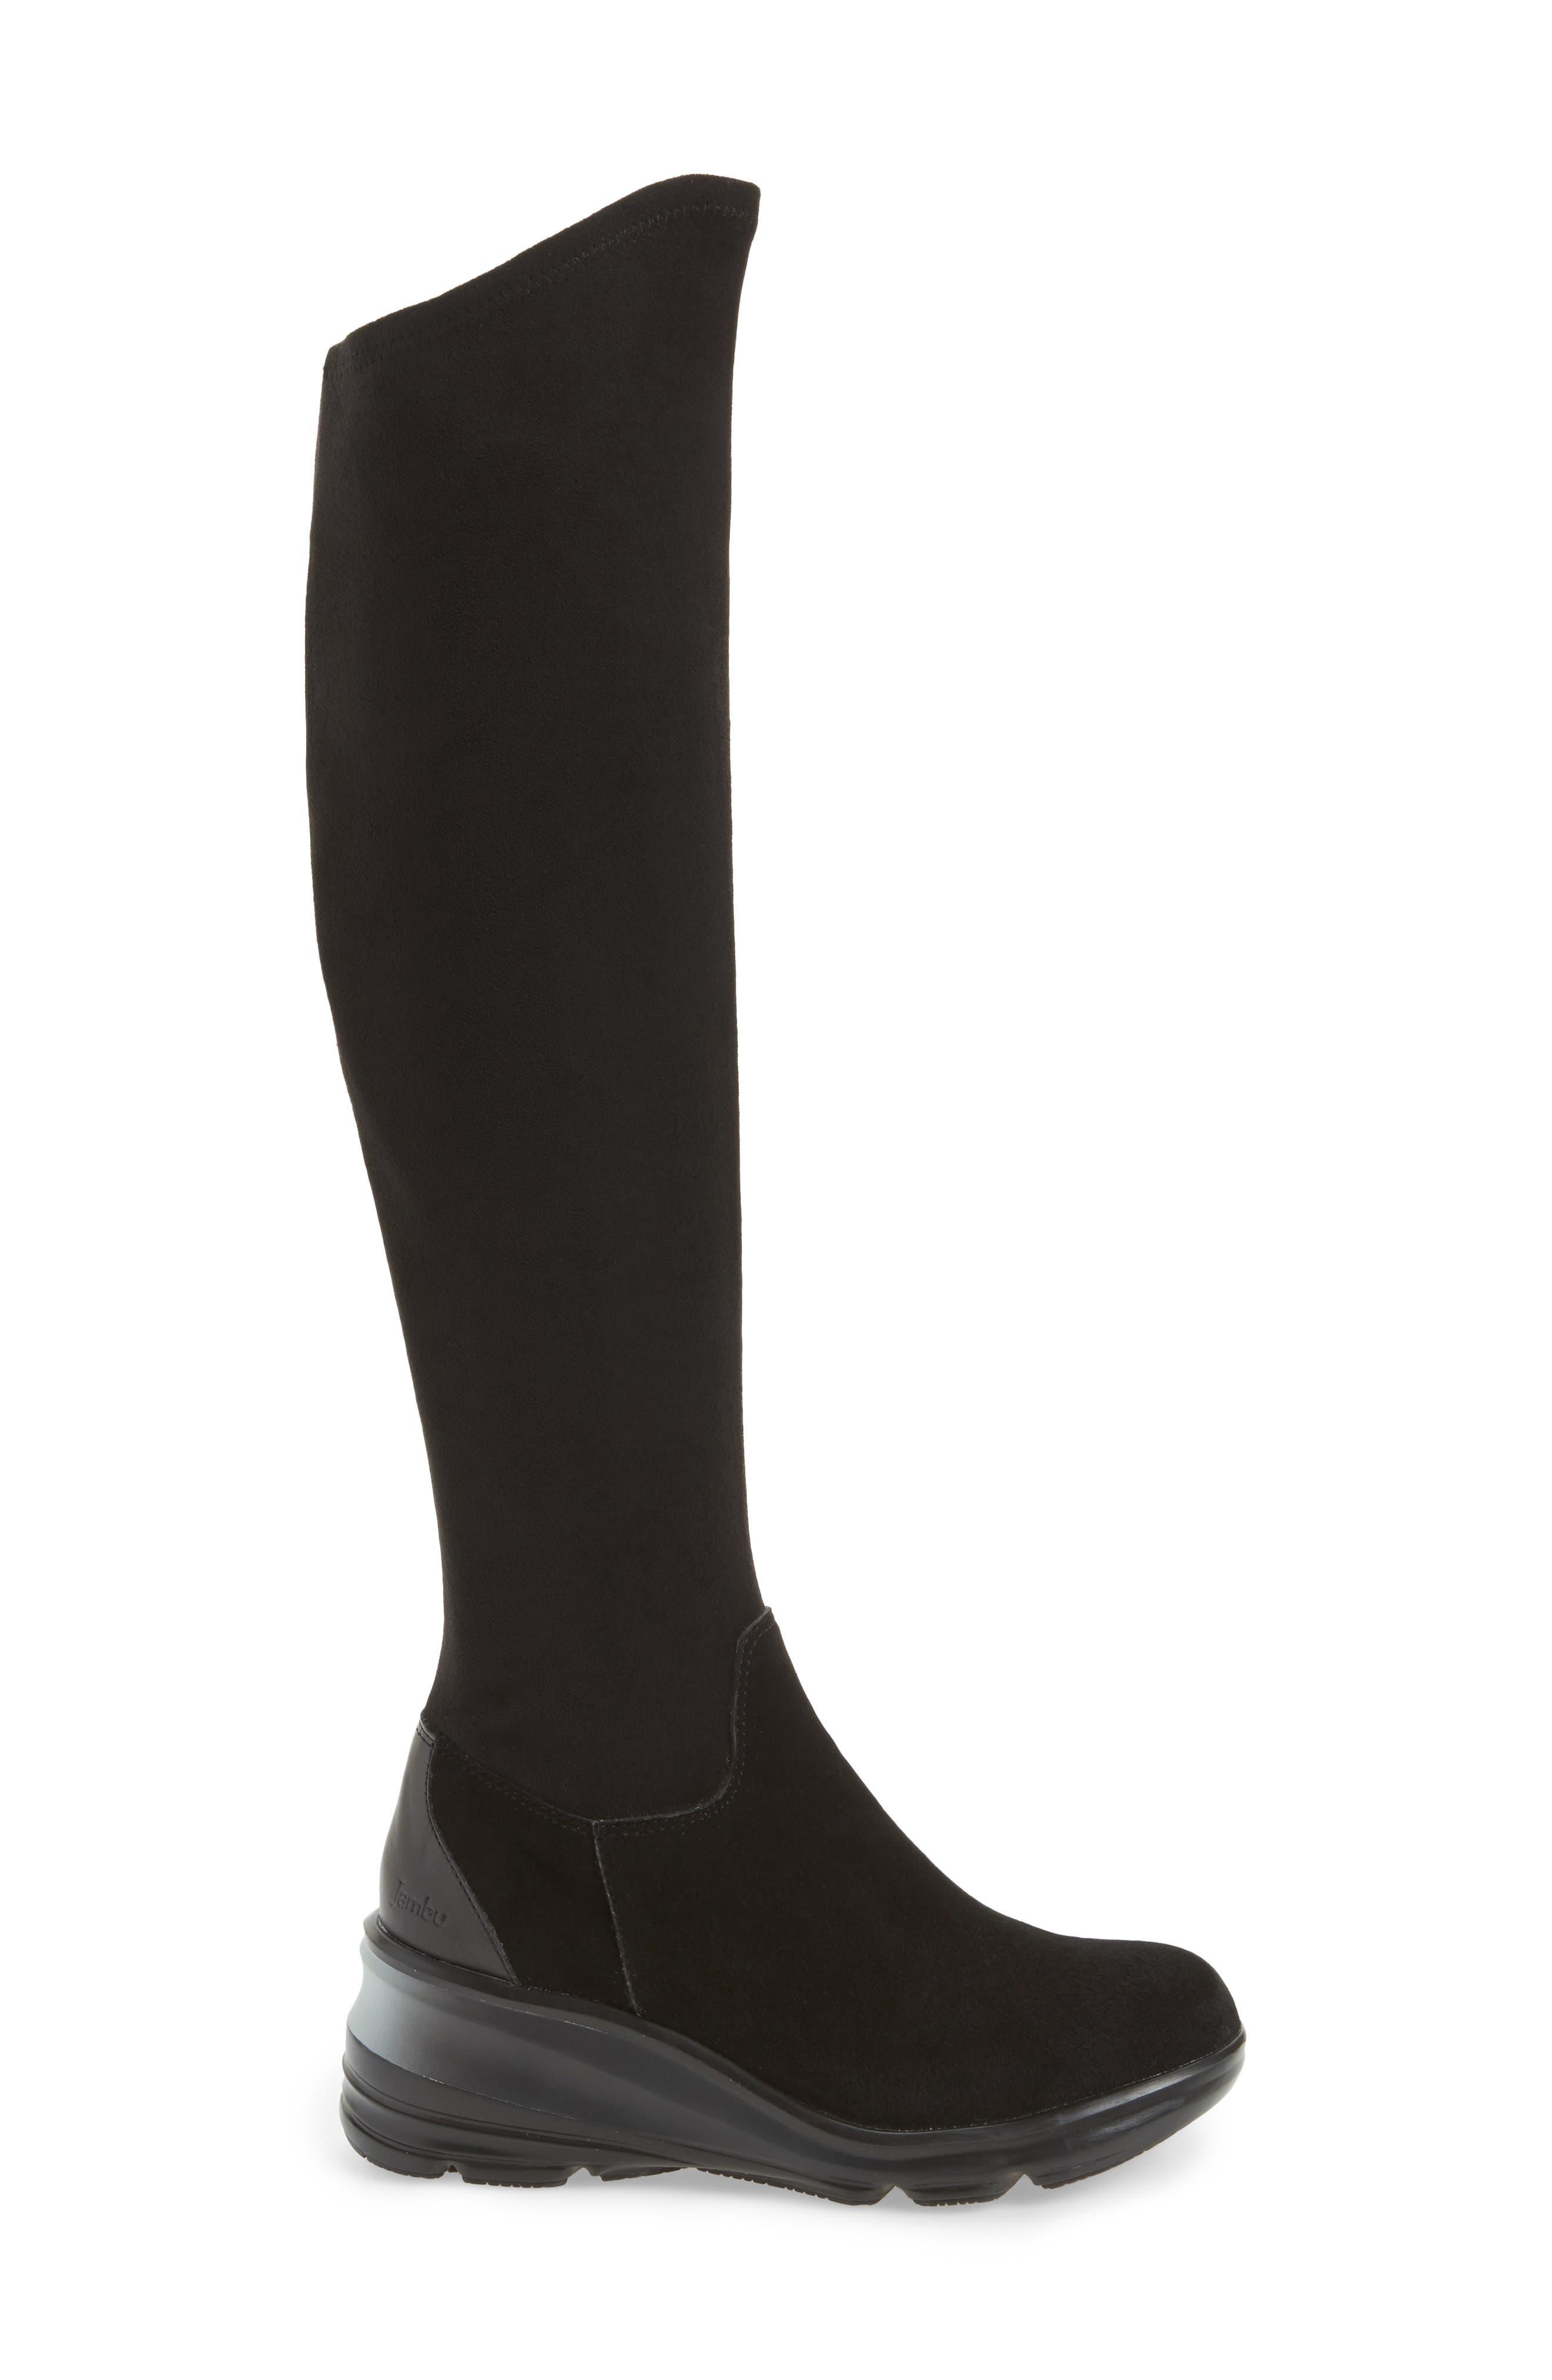 Alternate Image 3  - Jambu Kendra Over the Knee Water-Resistant Boot (Women)